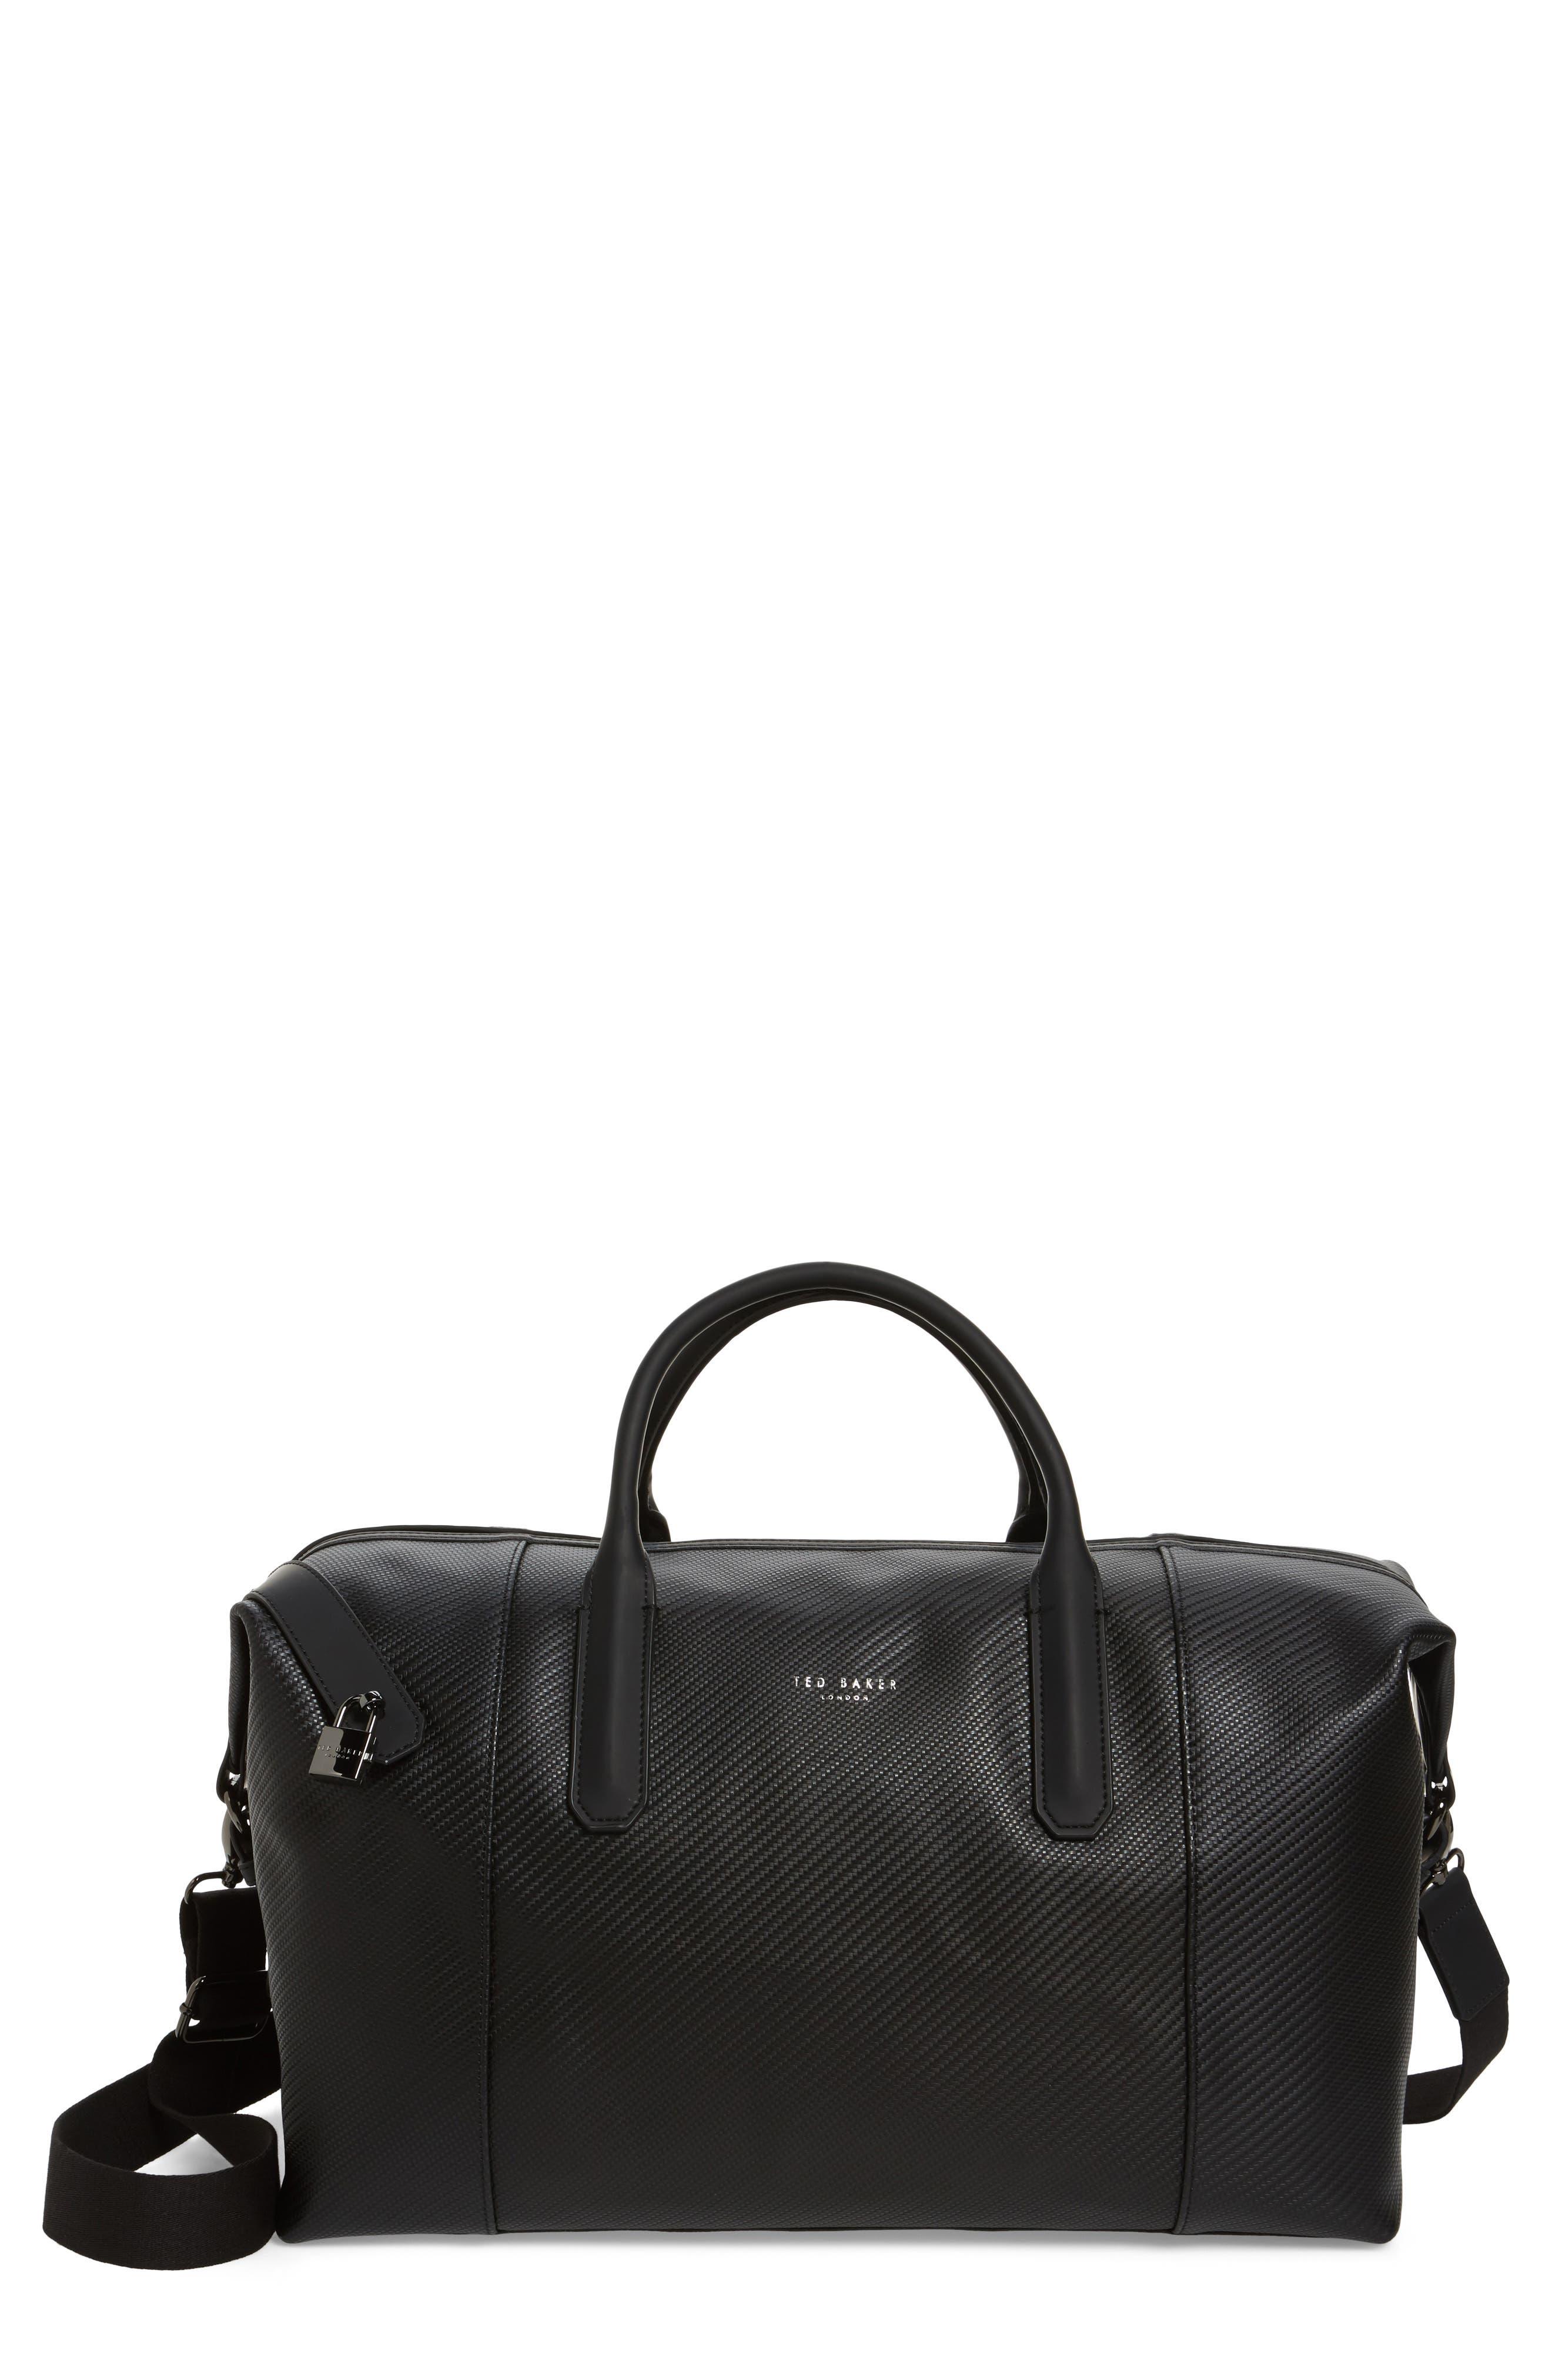 Novana Leather Duffel Bag,                             Main thumbnail 1, color,